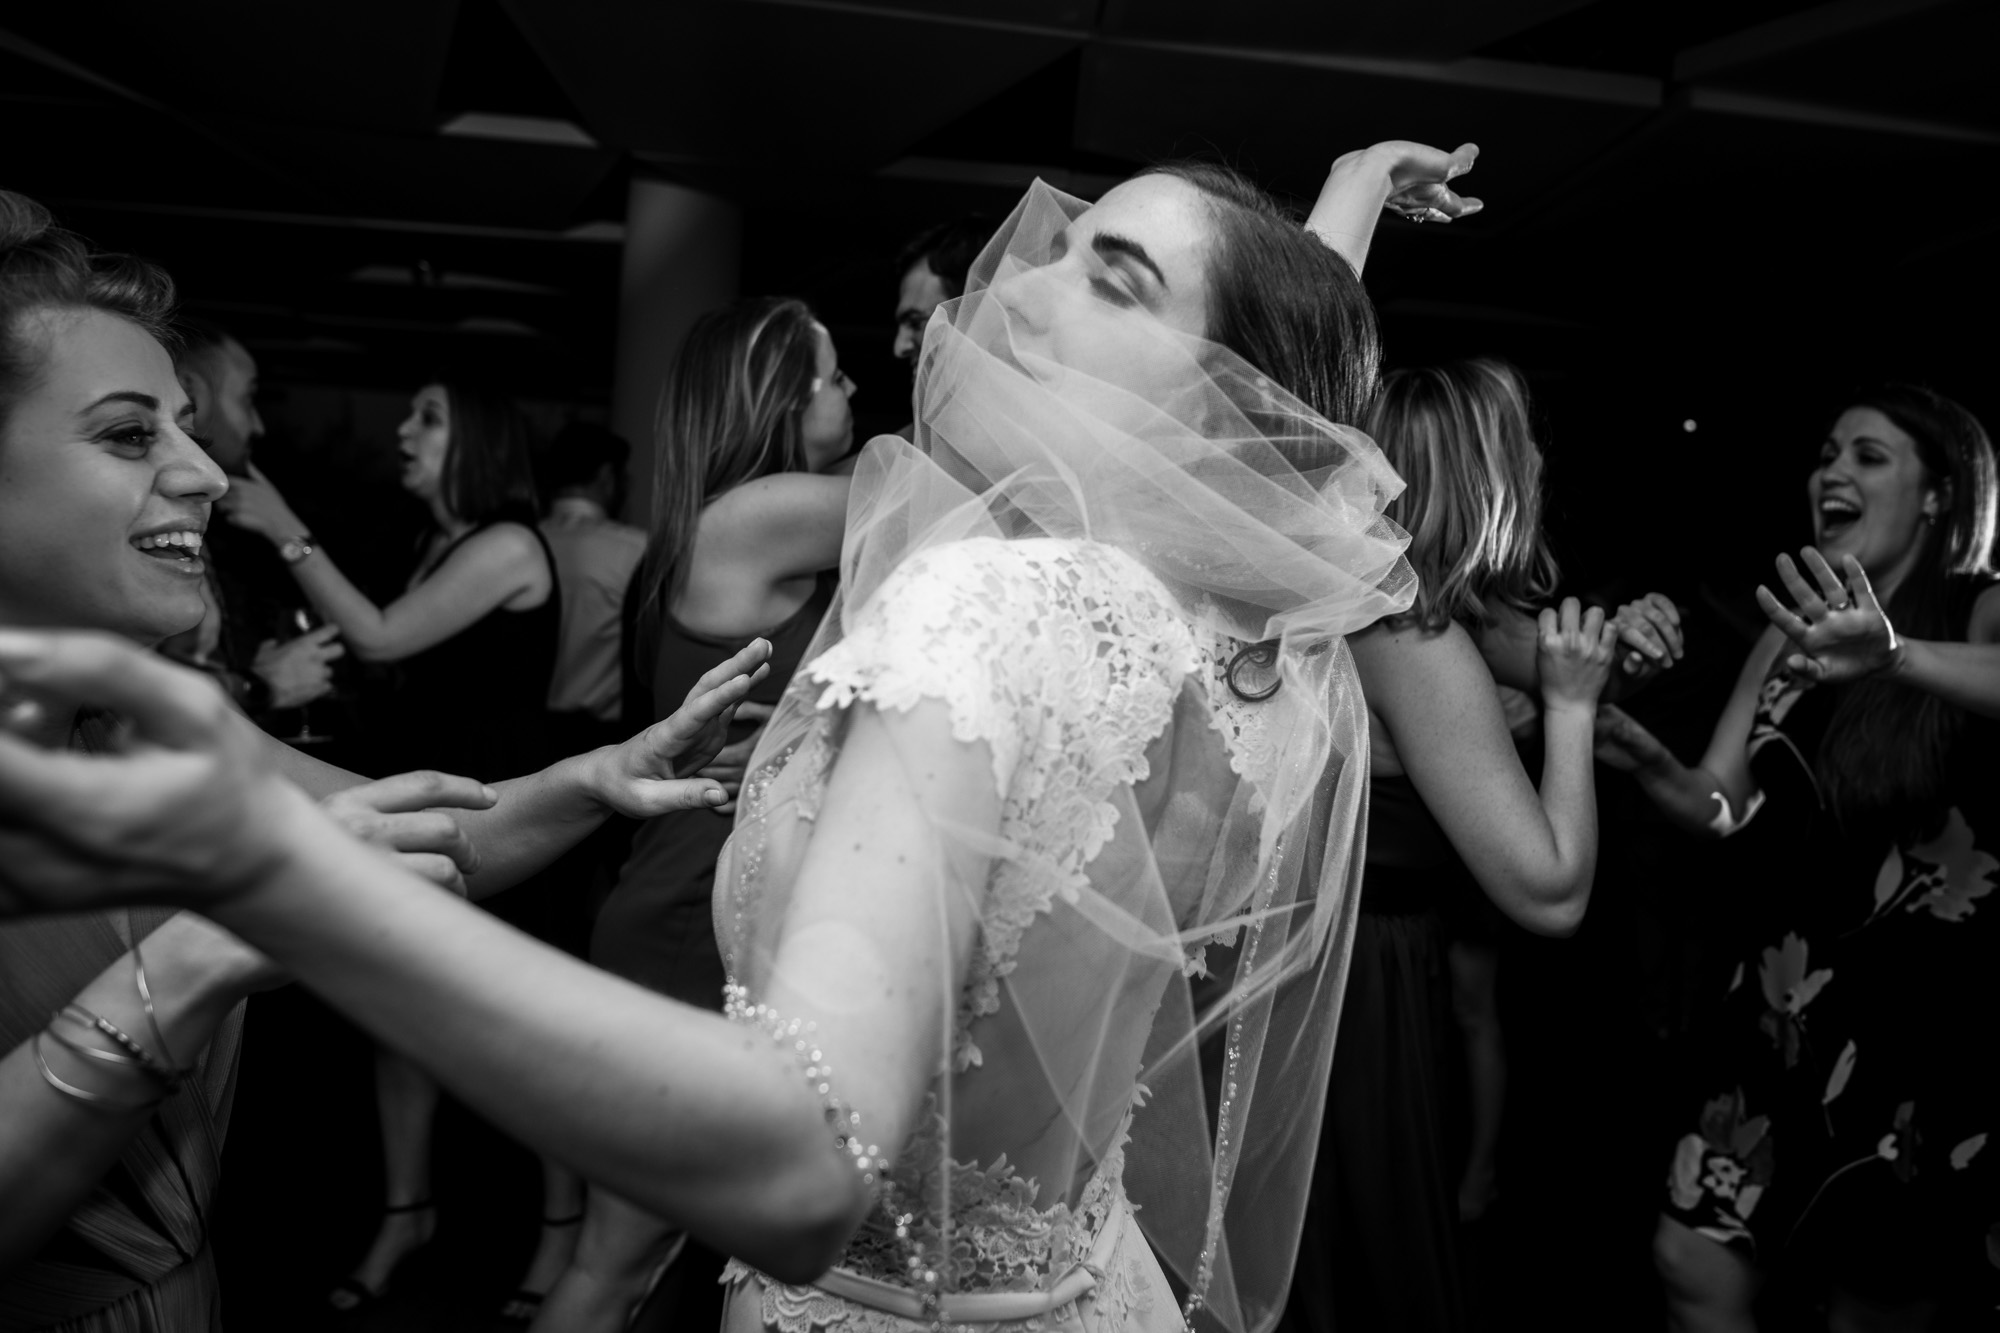 nj-wedding-photographer-maritime-parc-maria-david-54.jpg